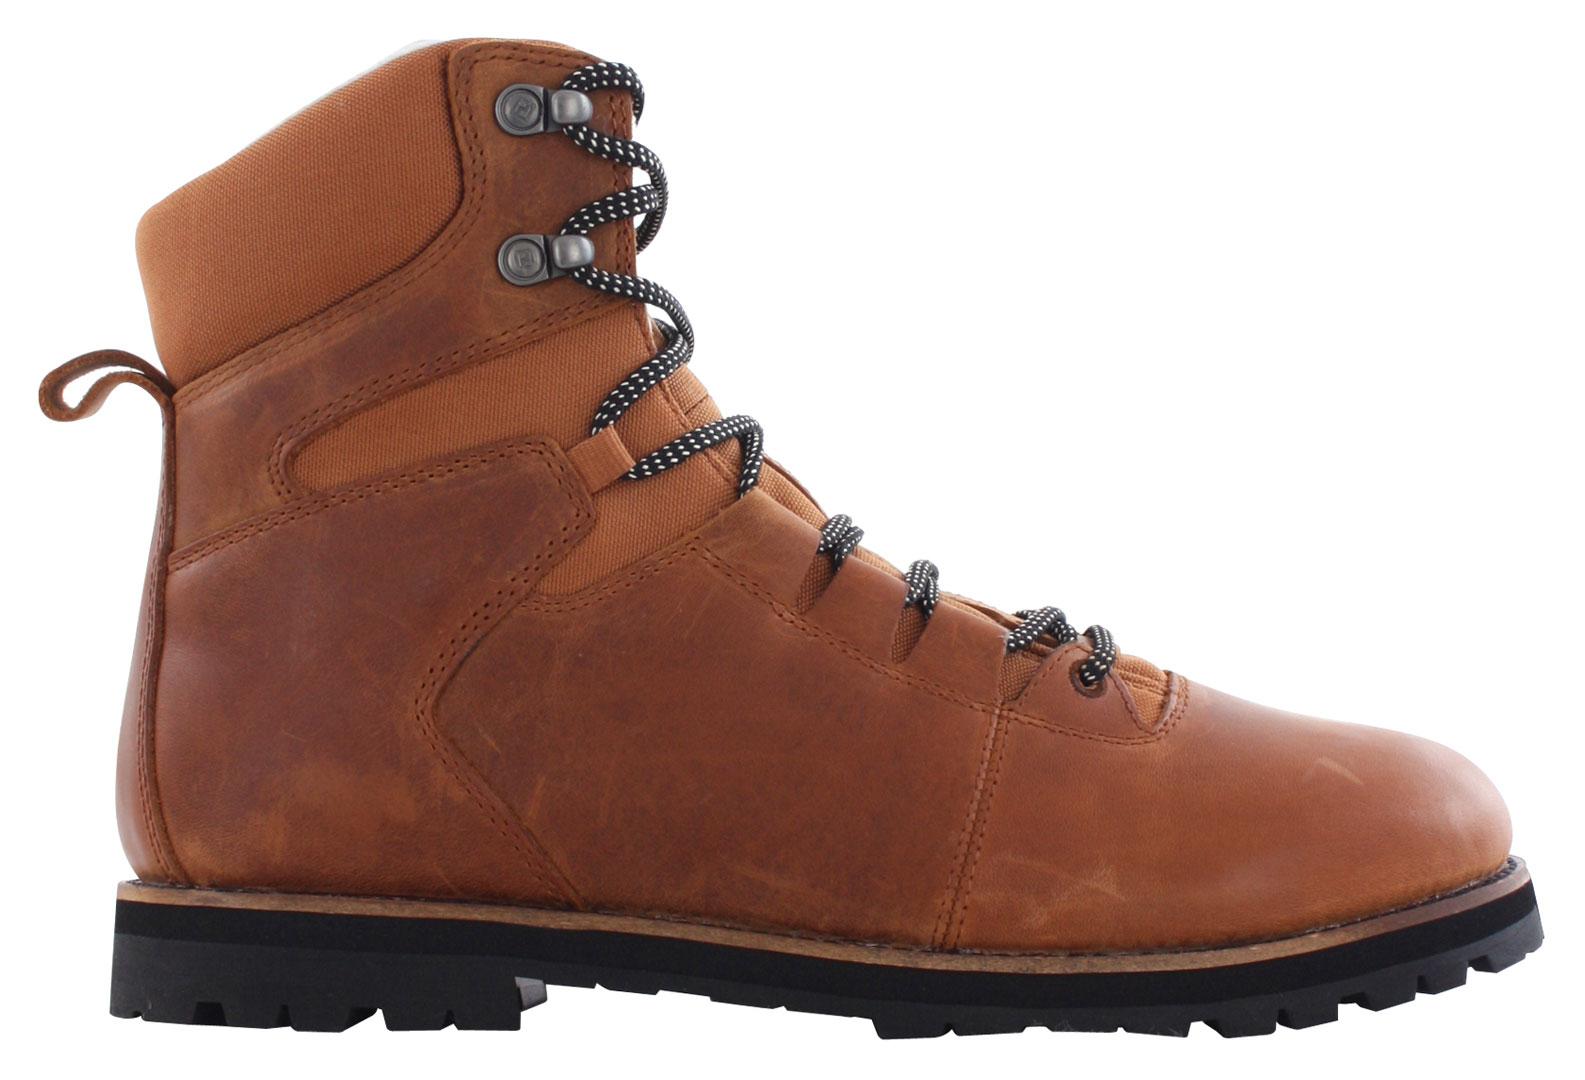 DEELUXE PRIME Shoe 2017 leather